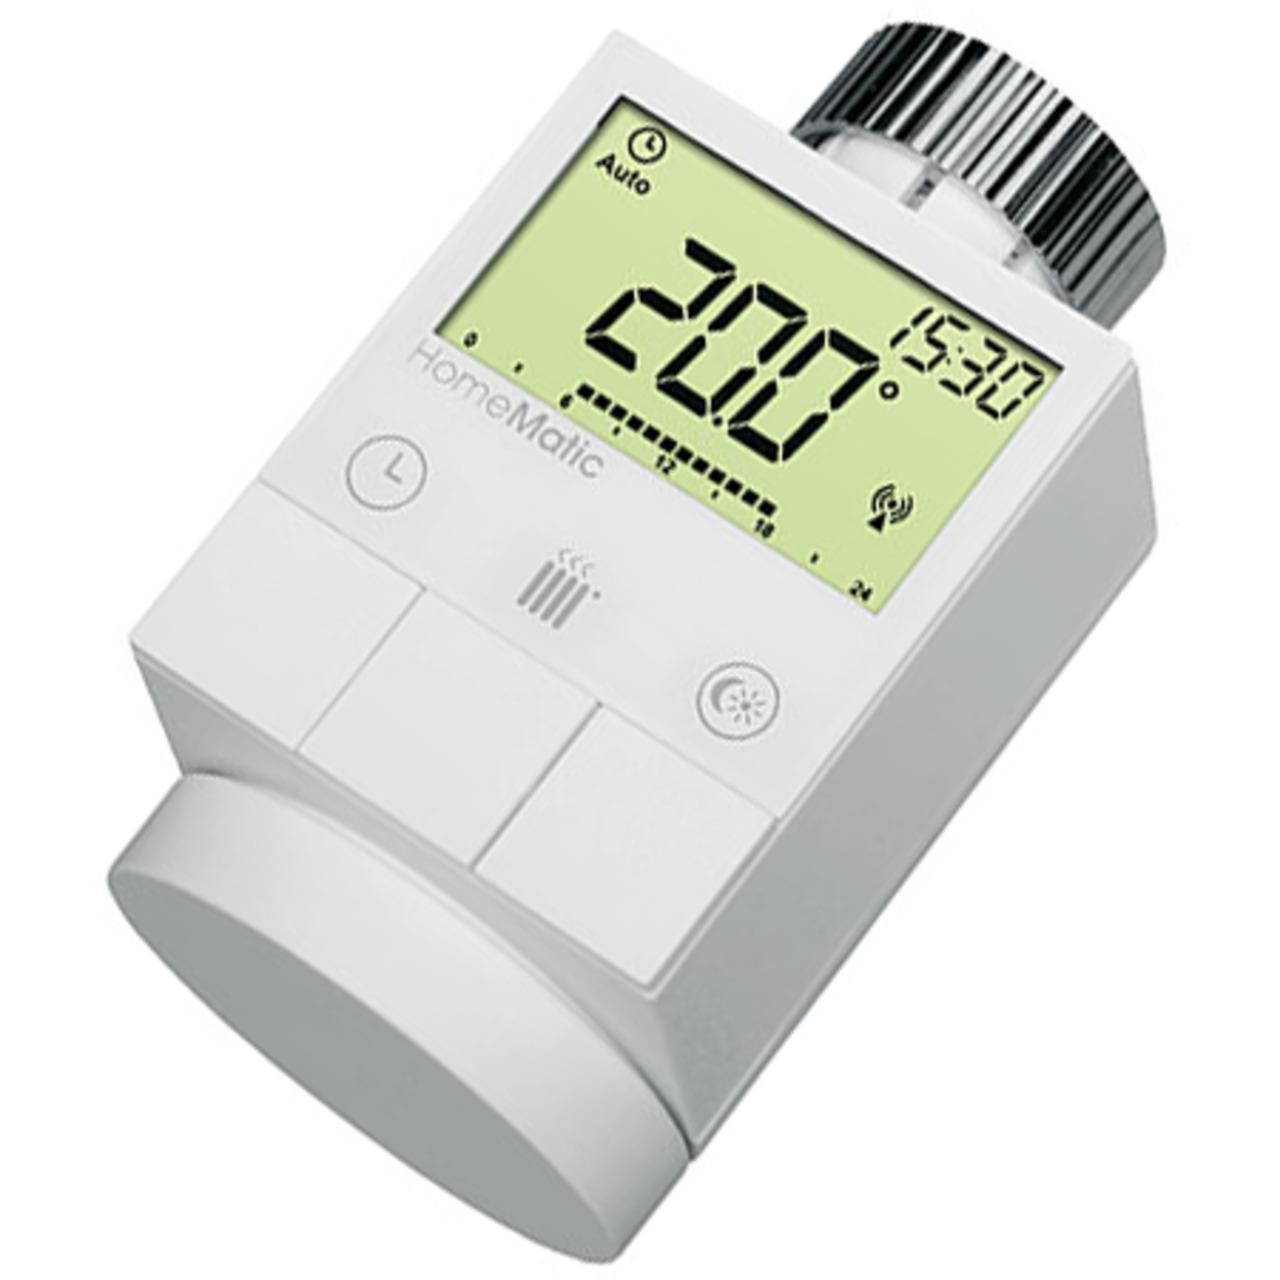 Homematic Funk-Heizkörperthermostat HM-CC-RT-DN für Smart Home / Hausautomation